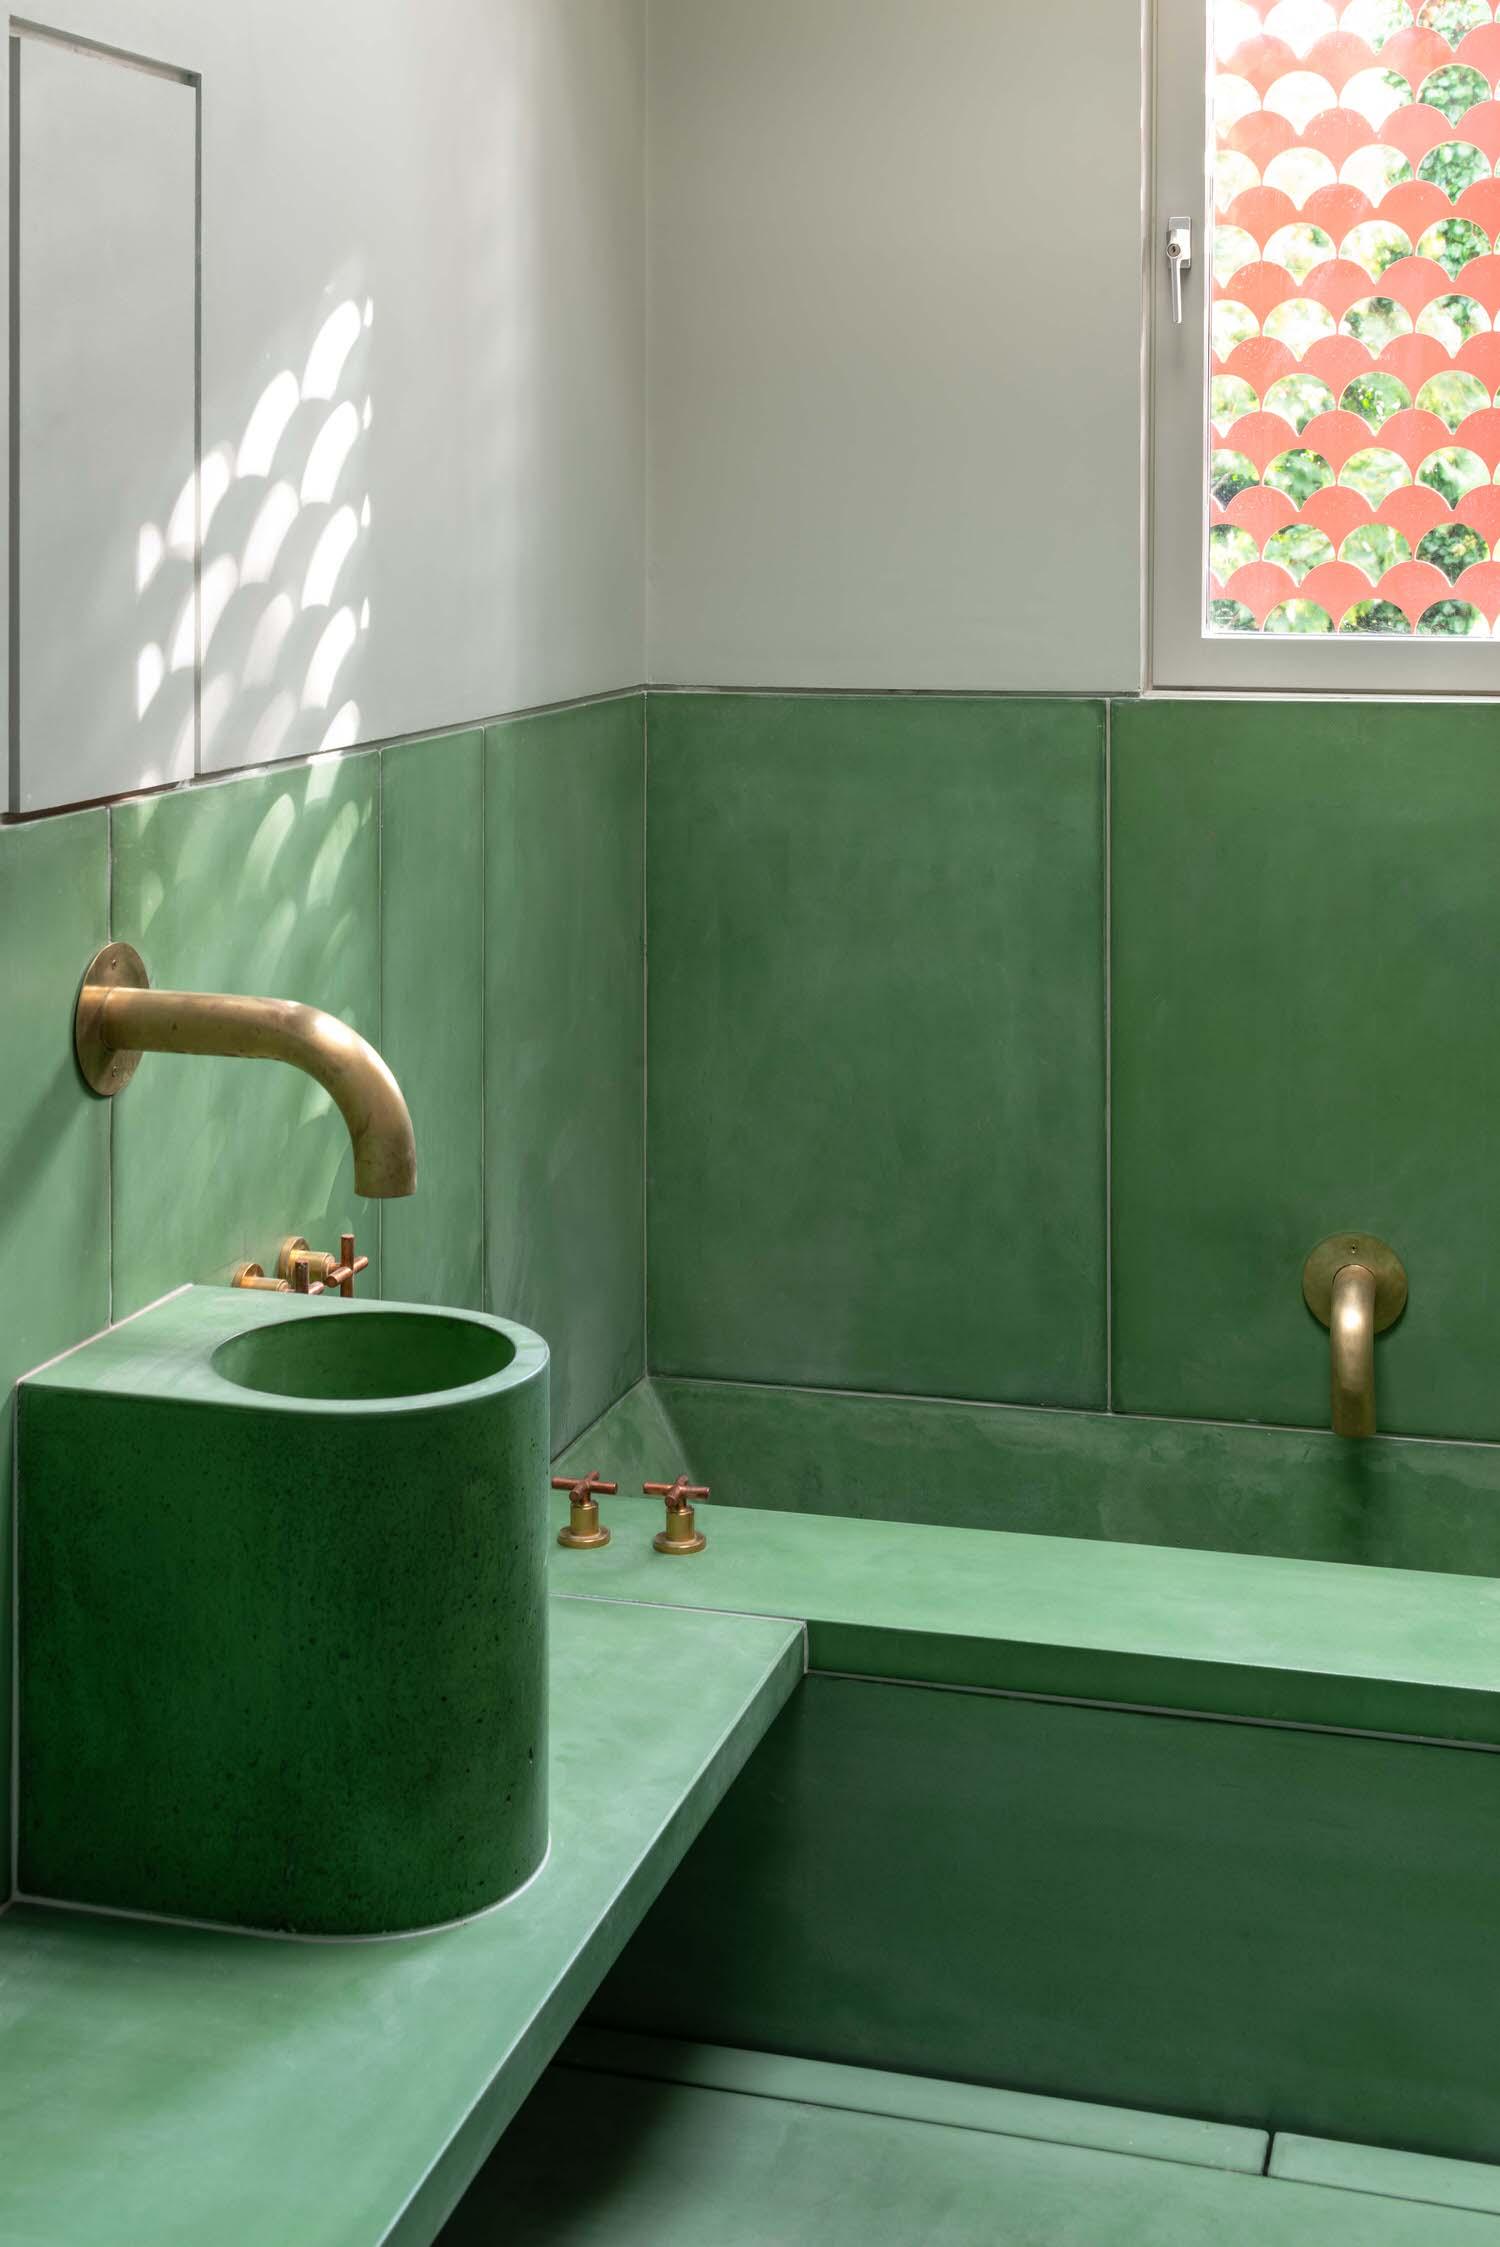 Studio Ben Allen House Recast London Residential Architecture Photo French+tye Yellowtrace 14